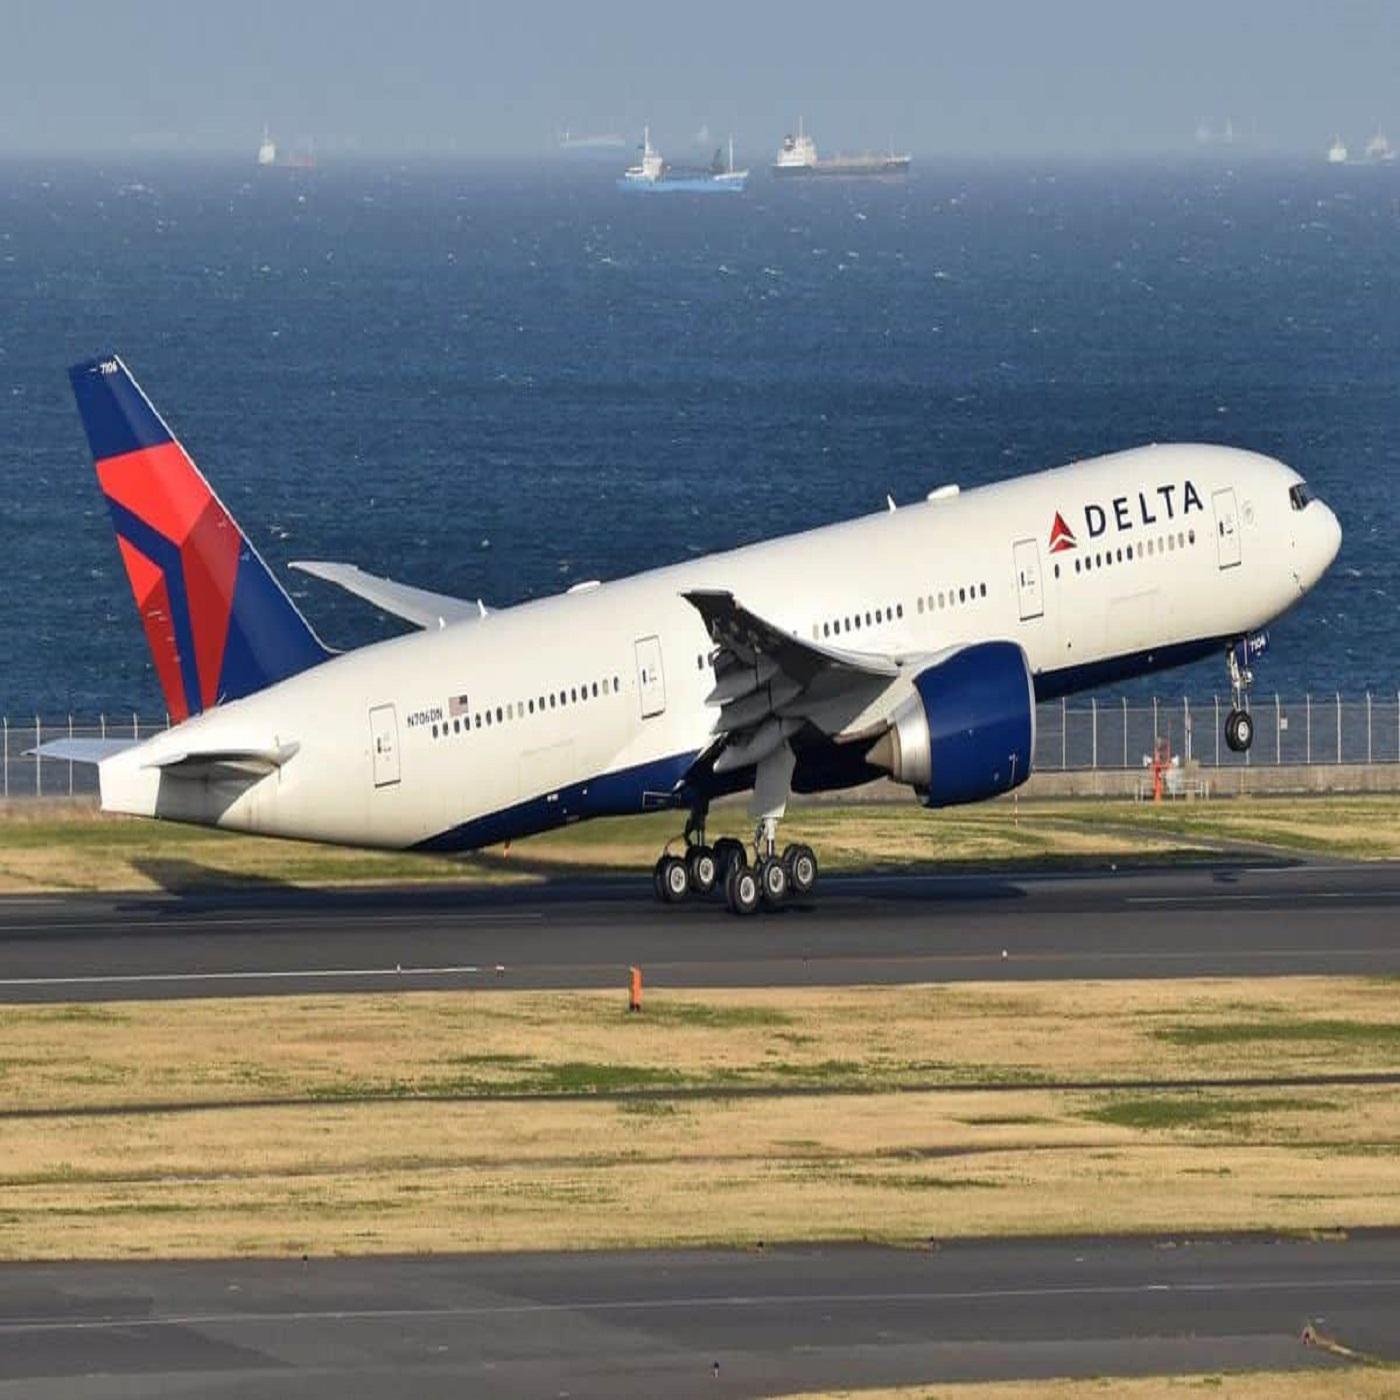 Senior Citizen Flight Discount (800) 348-5370 Delta Airlines - Sky Fly Trips